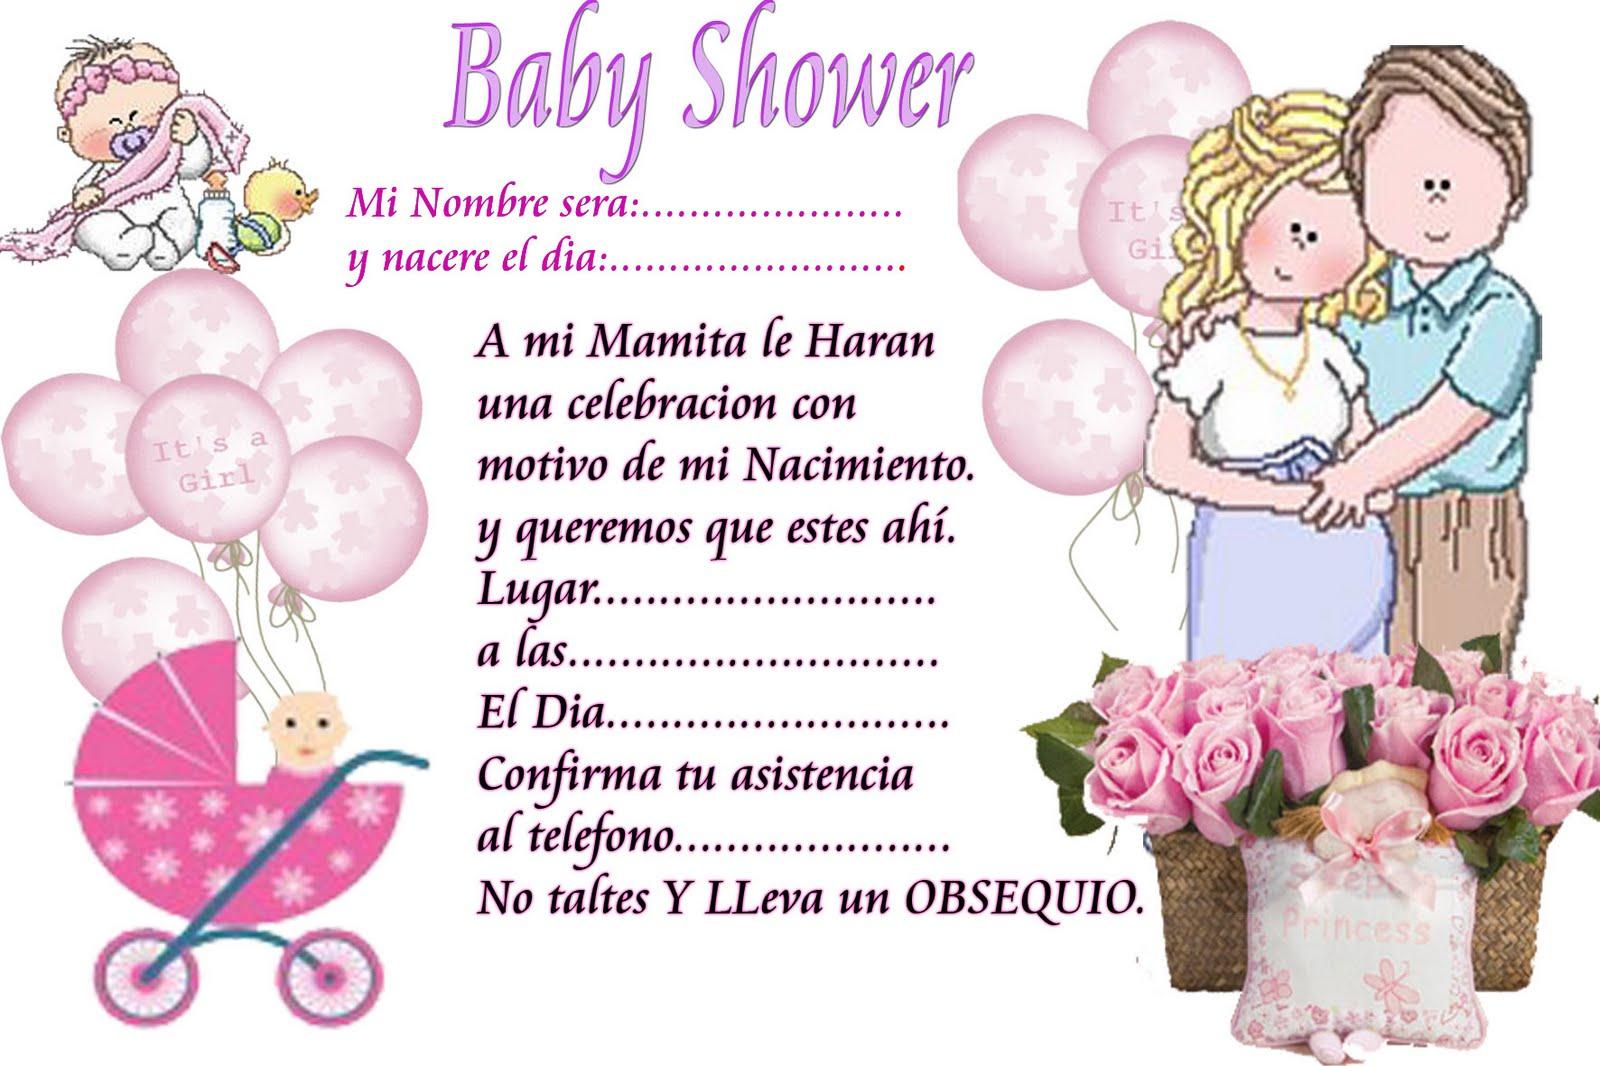 Juegos Originales Para Baby Shower Poussettes